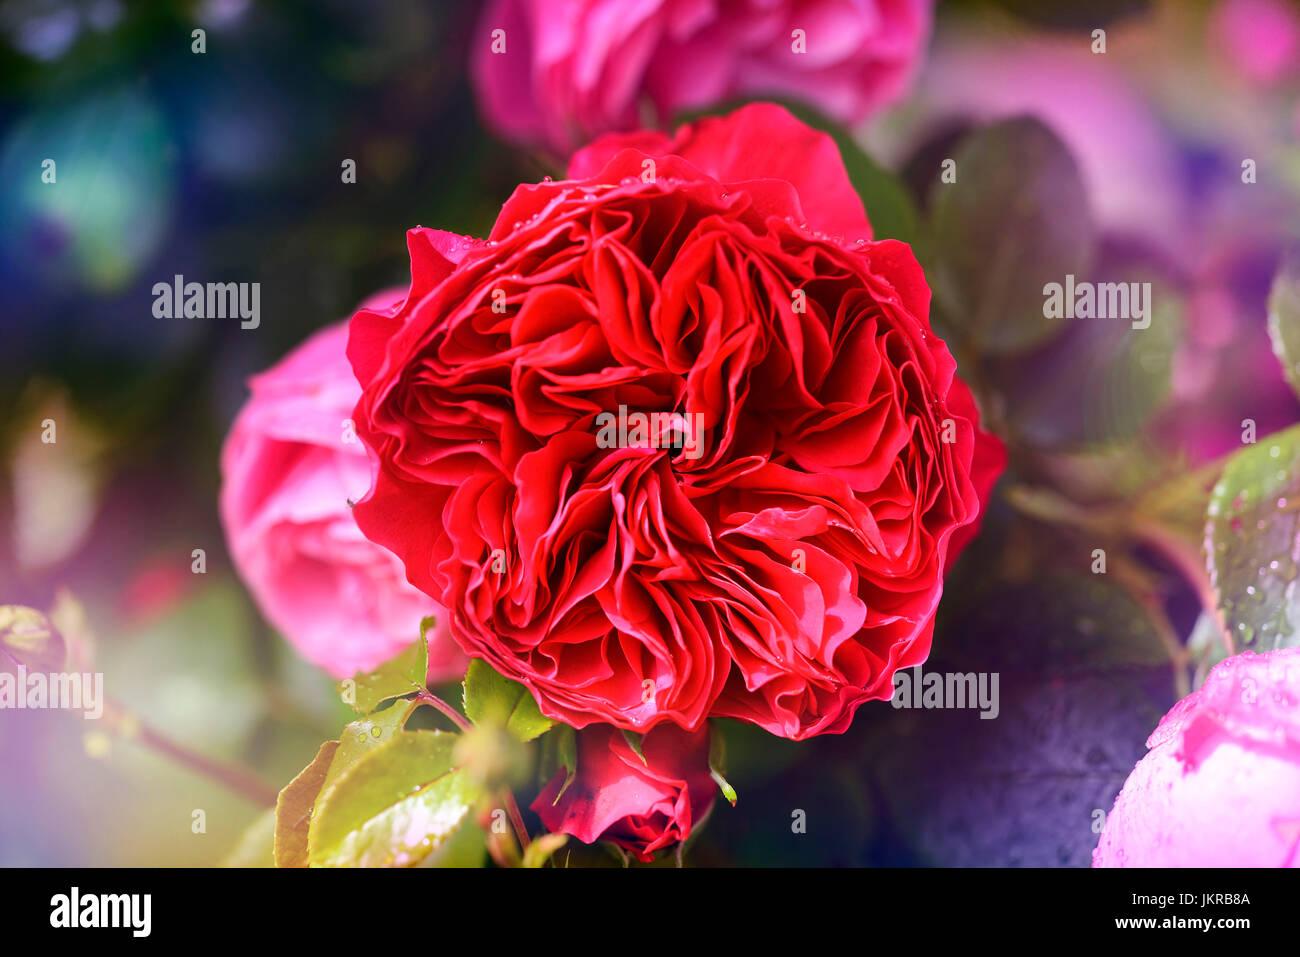 Rose Red Leonardo da Vinci Stockbild